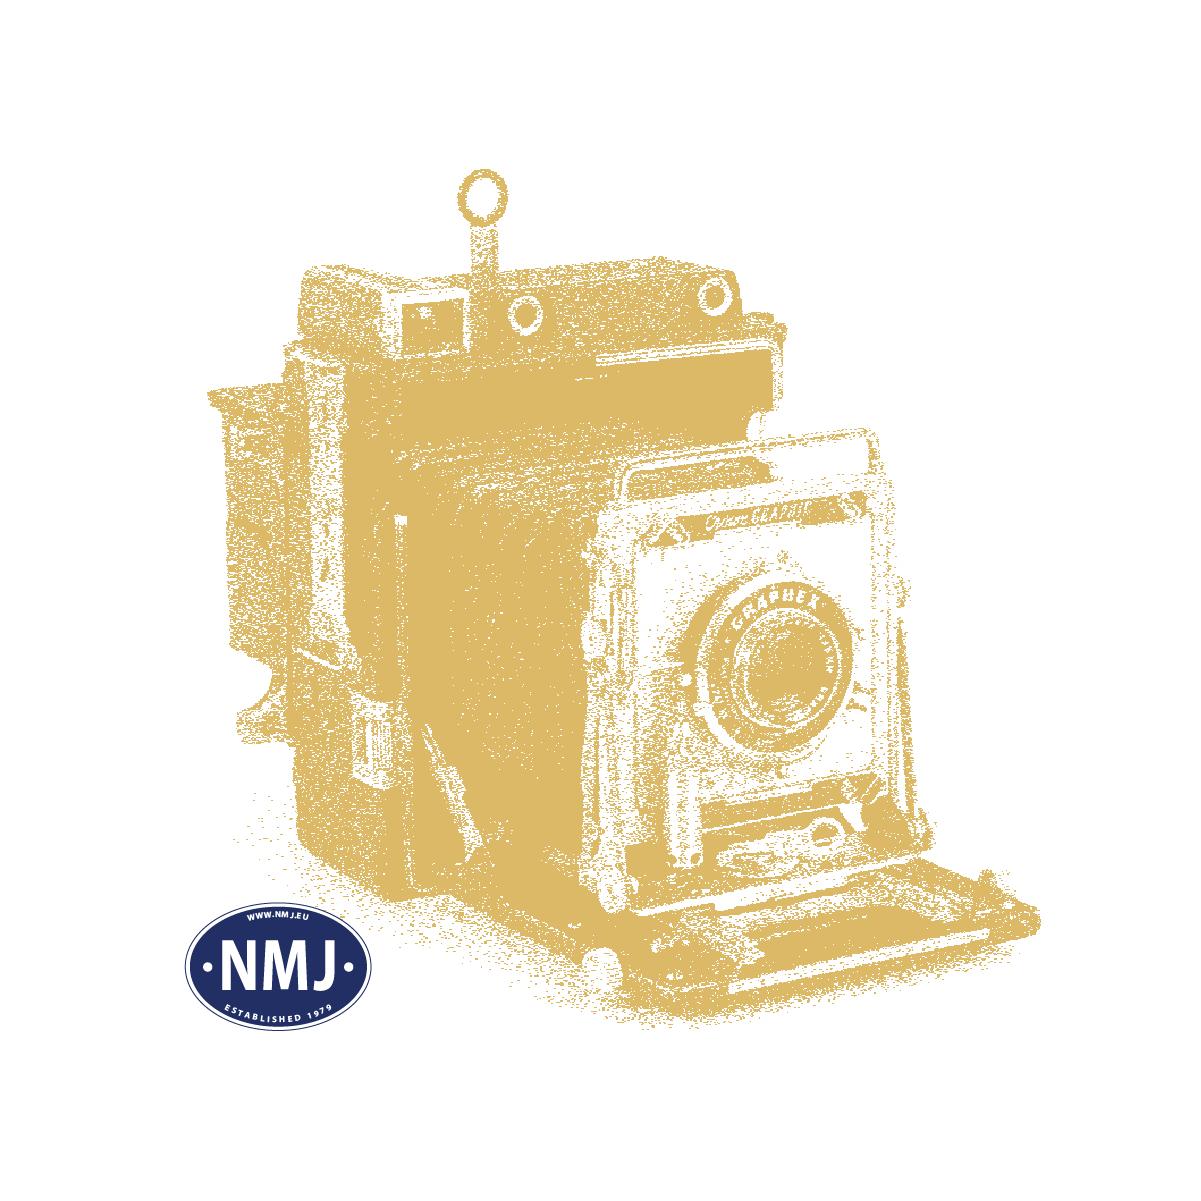 NMJT506.303 - NMJ Topline Gbs 150 0 111-2 Gepäckwagen der NSB